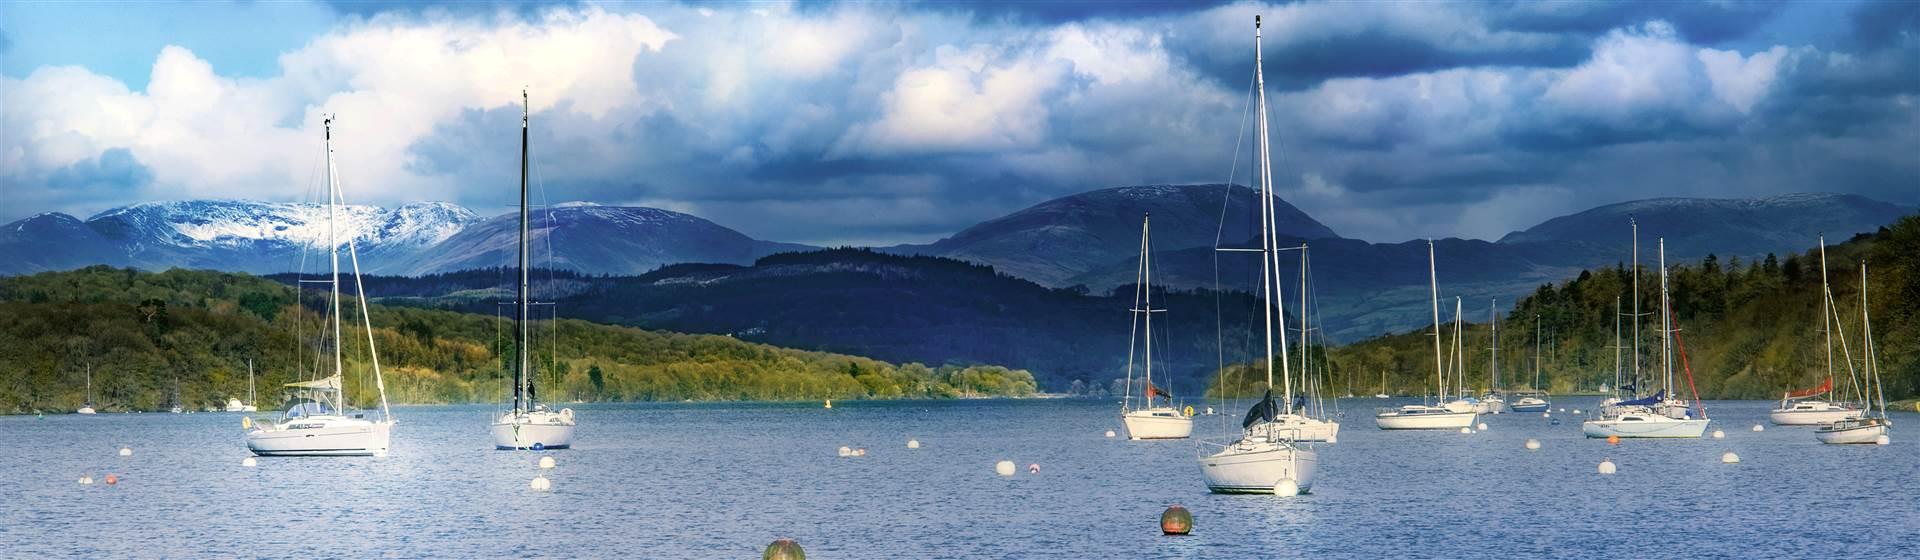 Splendid Lakes All Inclusive